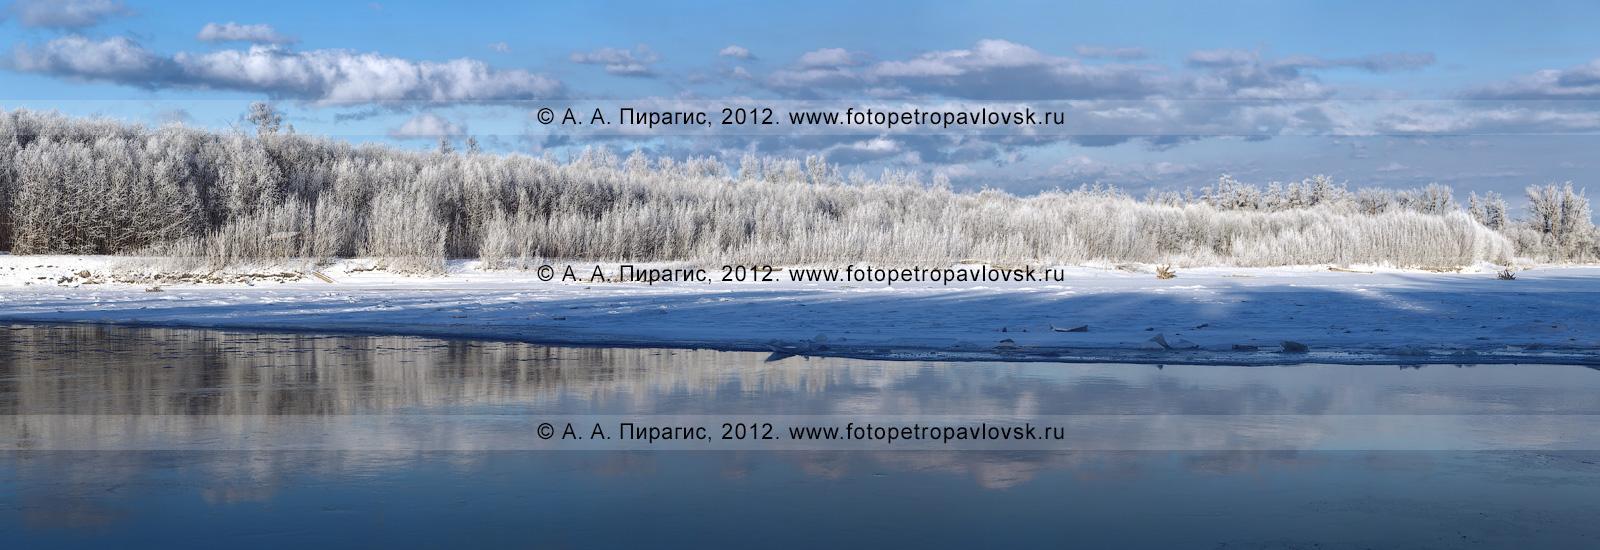 Река Камчатка зимой